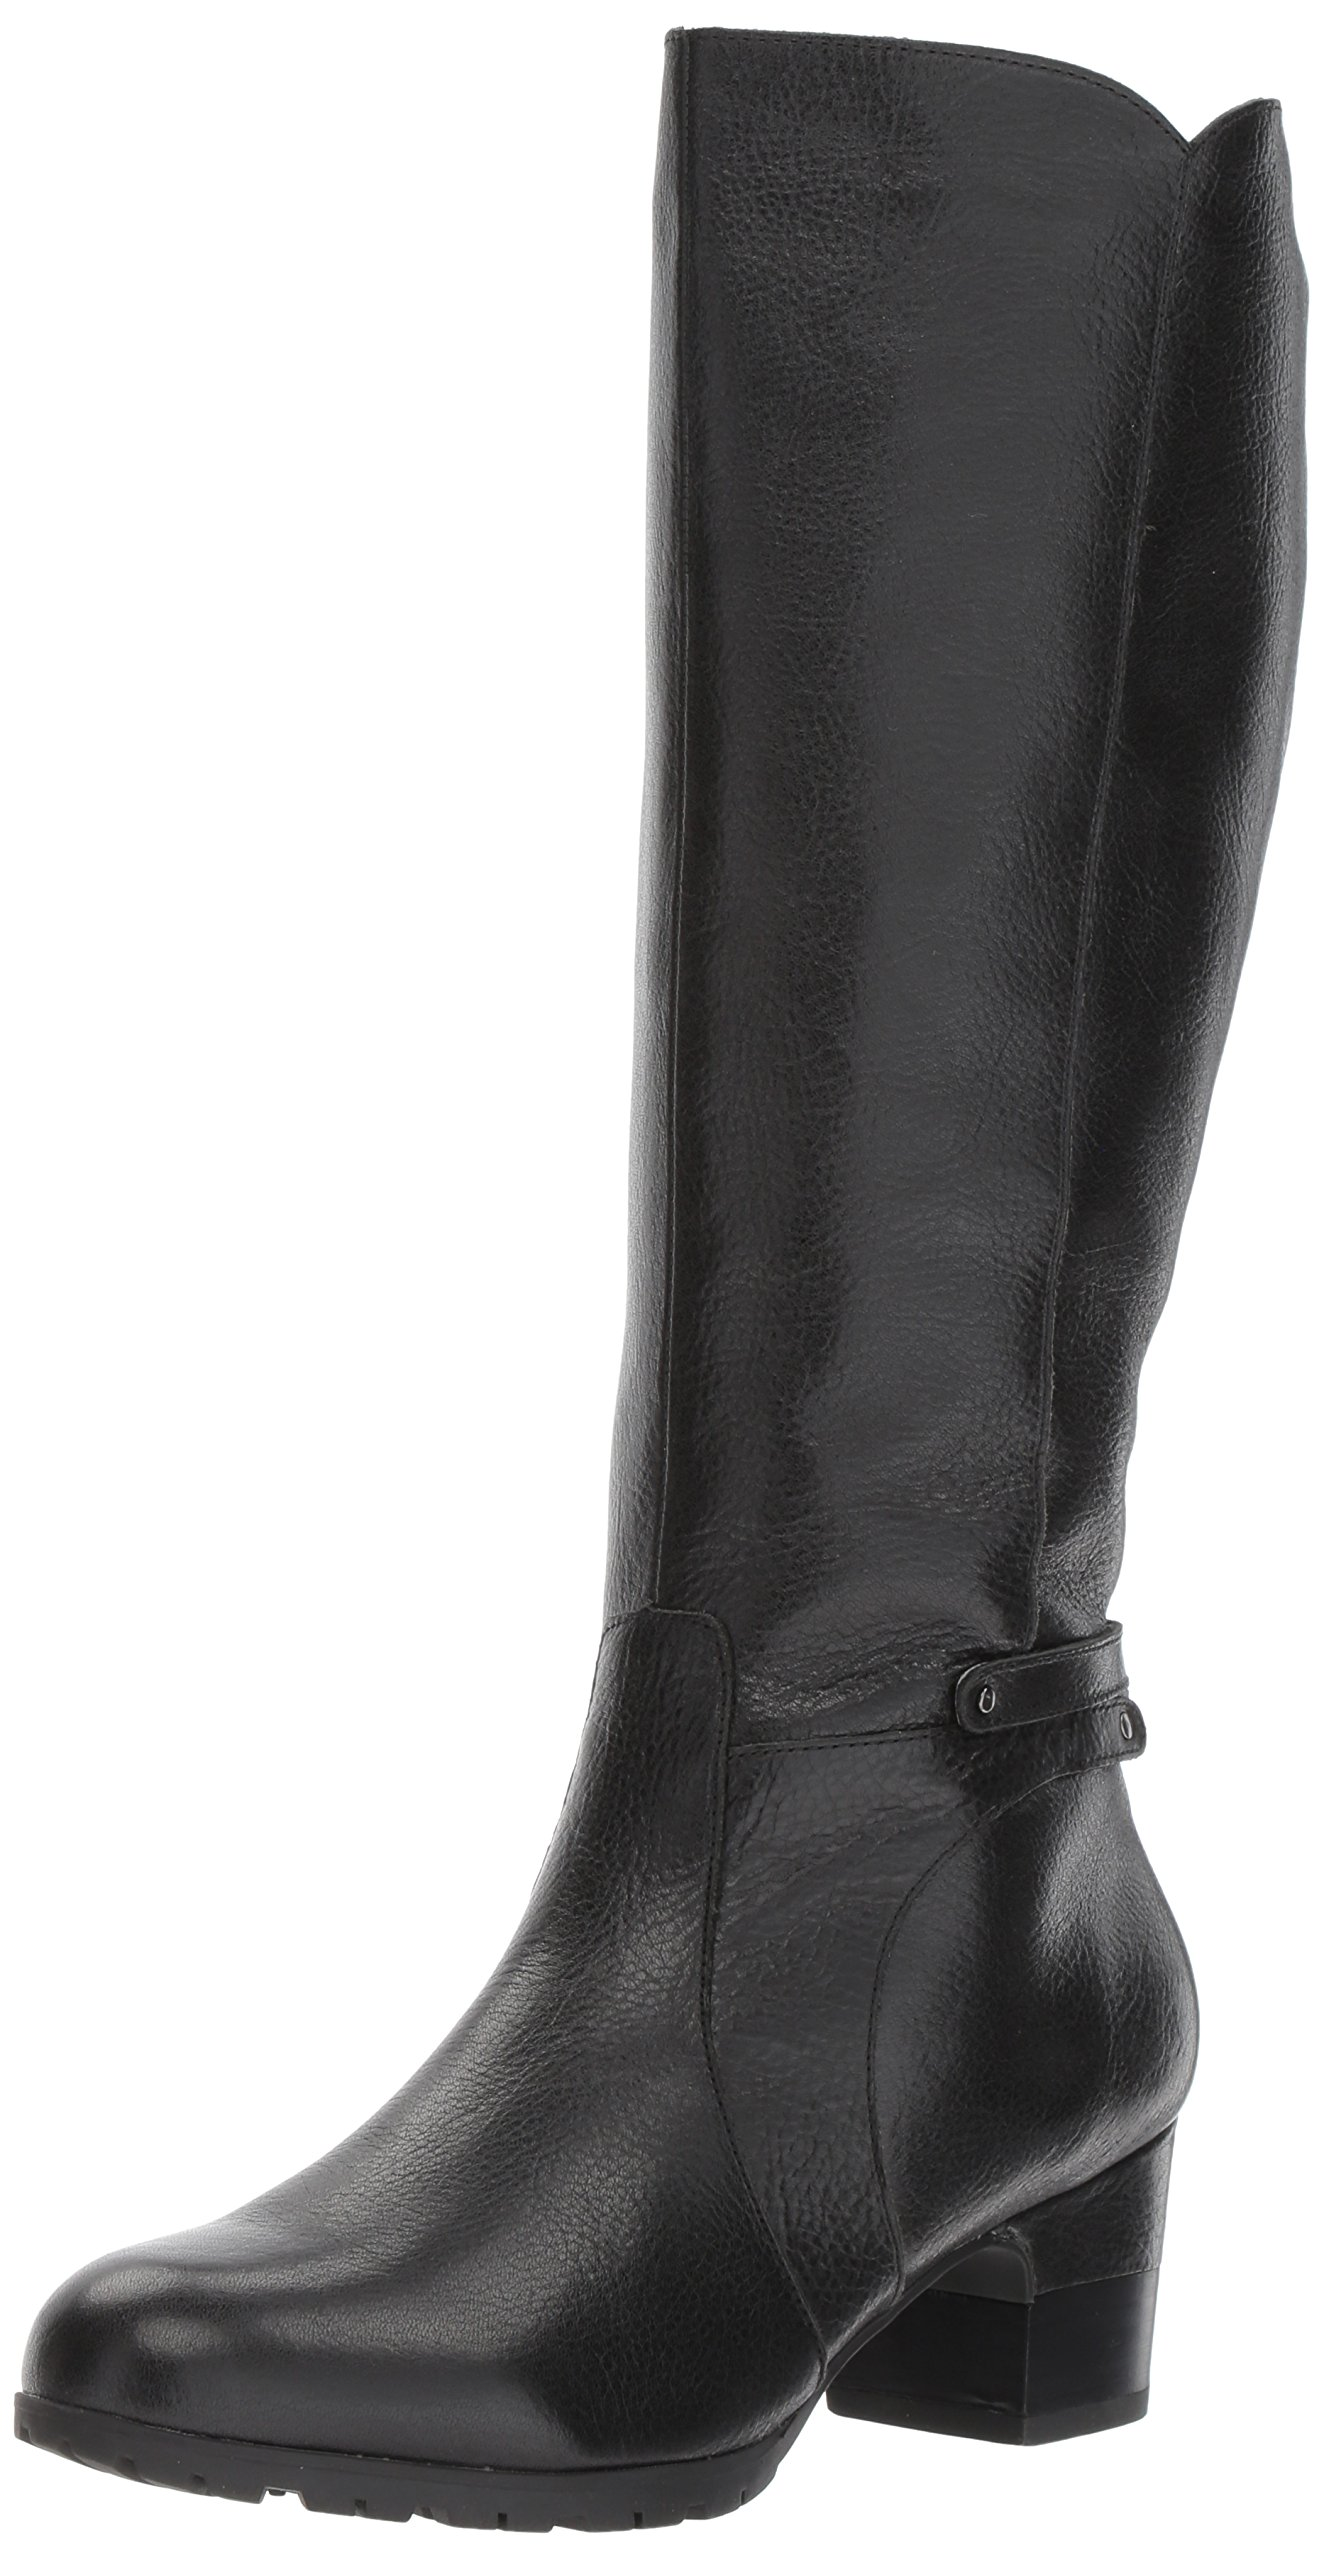 Jambu Women's Chai Water Resistant Riding Boot, Black, 8.5 M US